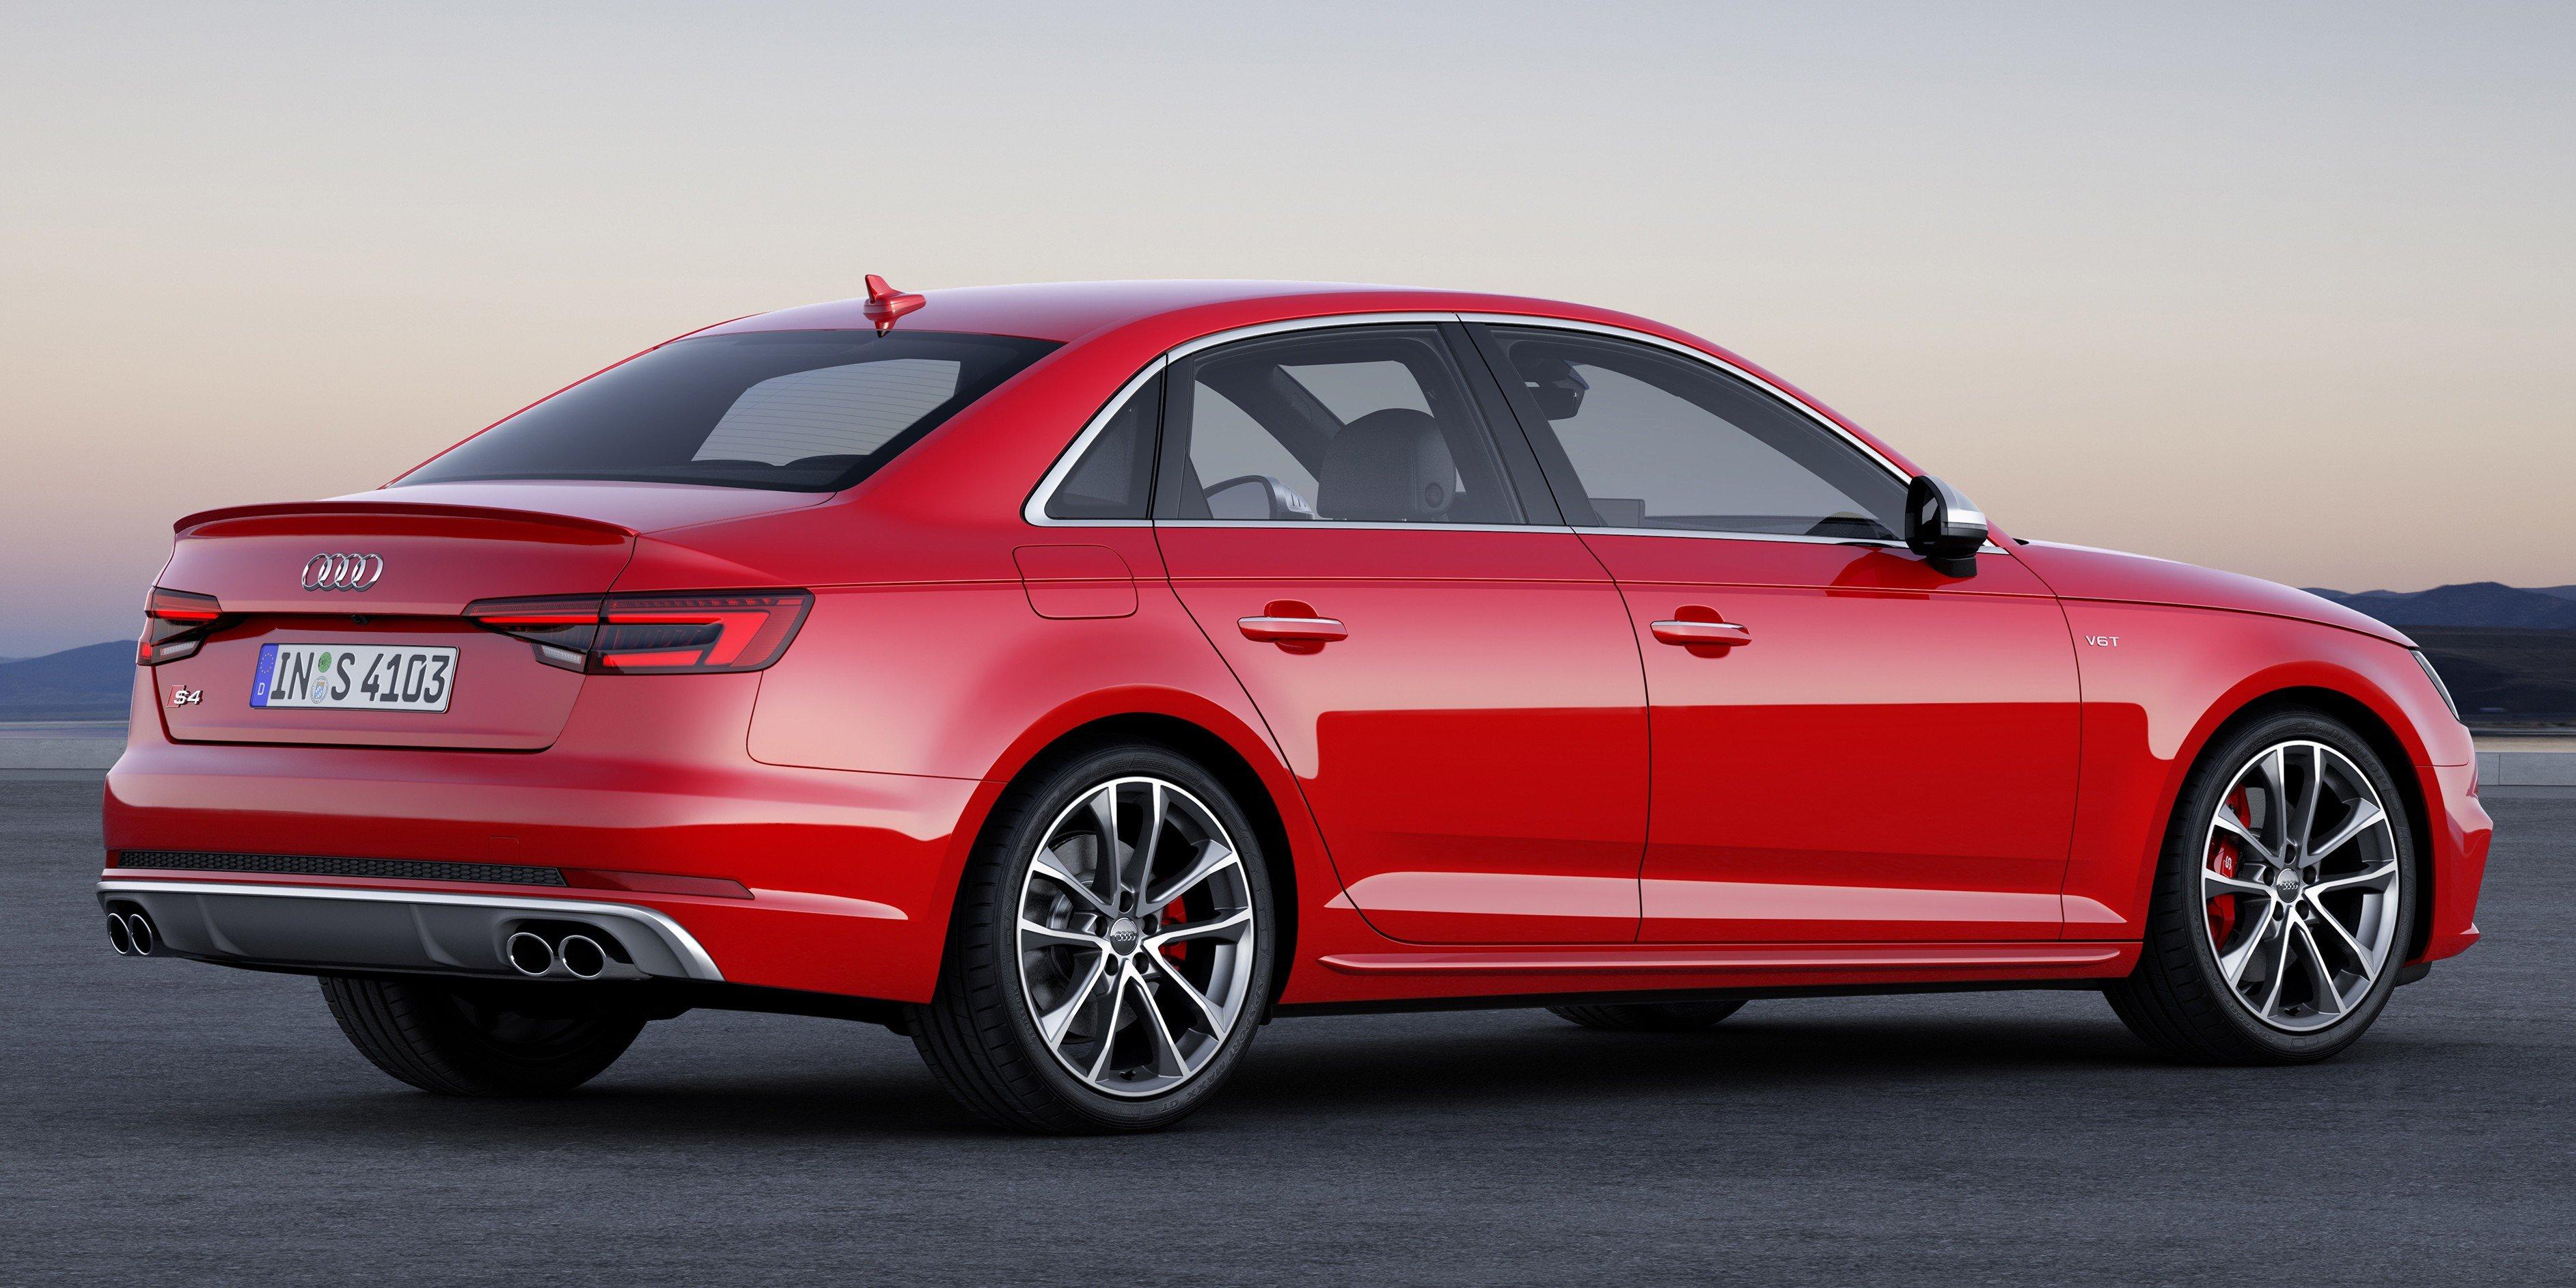 Frankfurt 2015 B9 Audi S4 Revealed Packing 354 Ps Paul